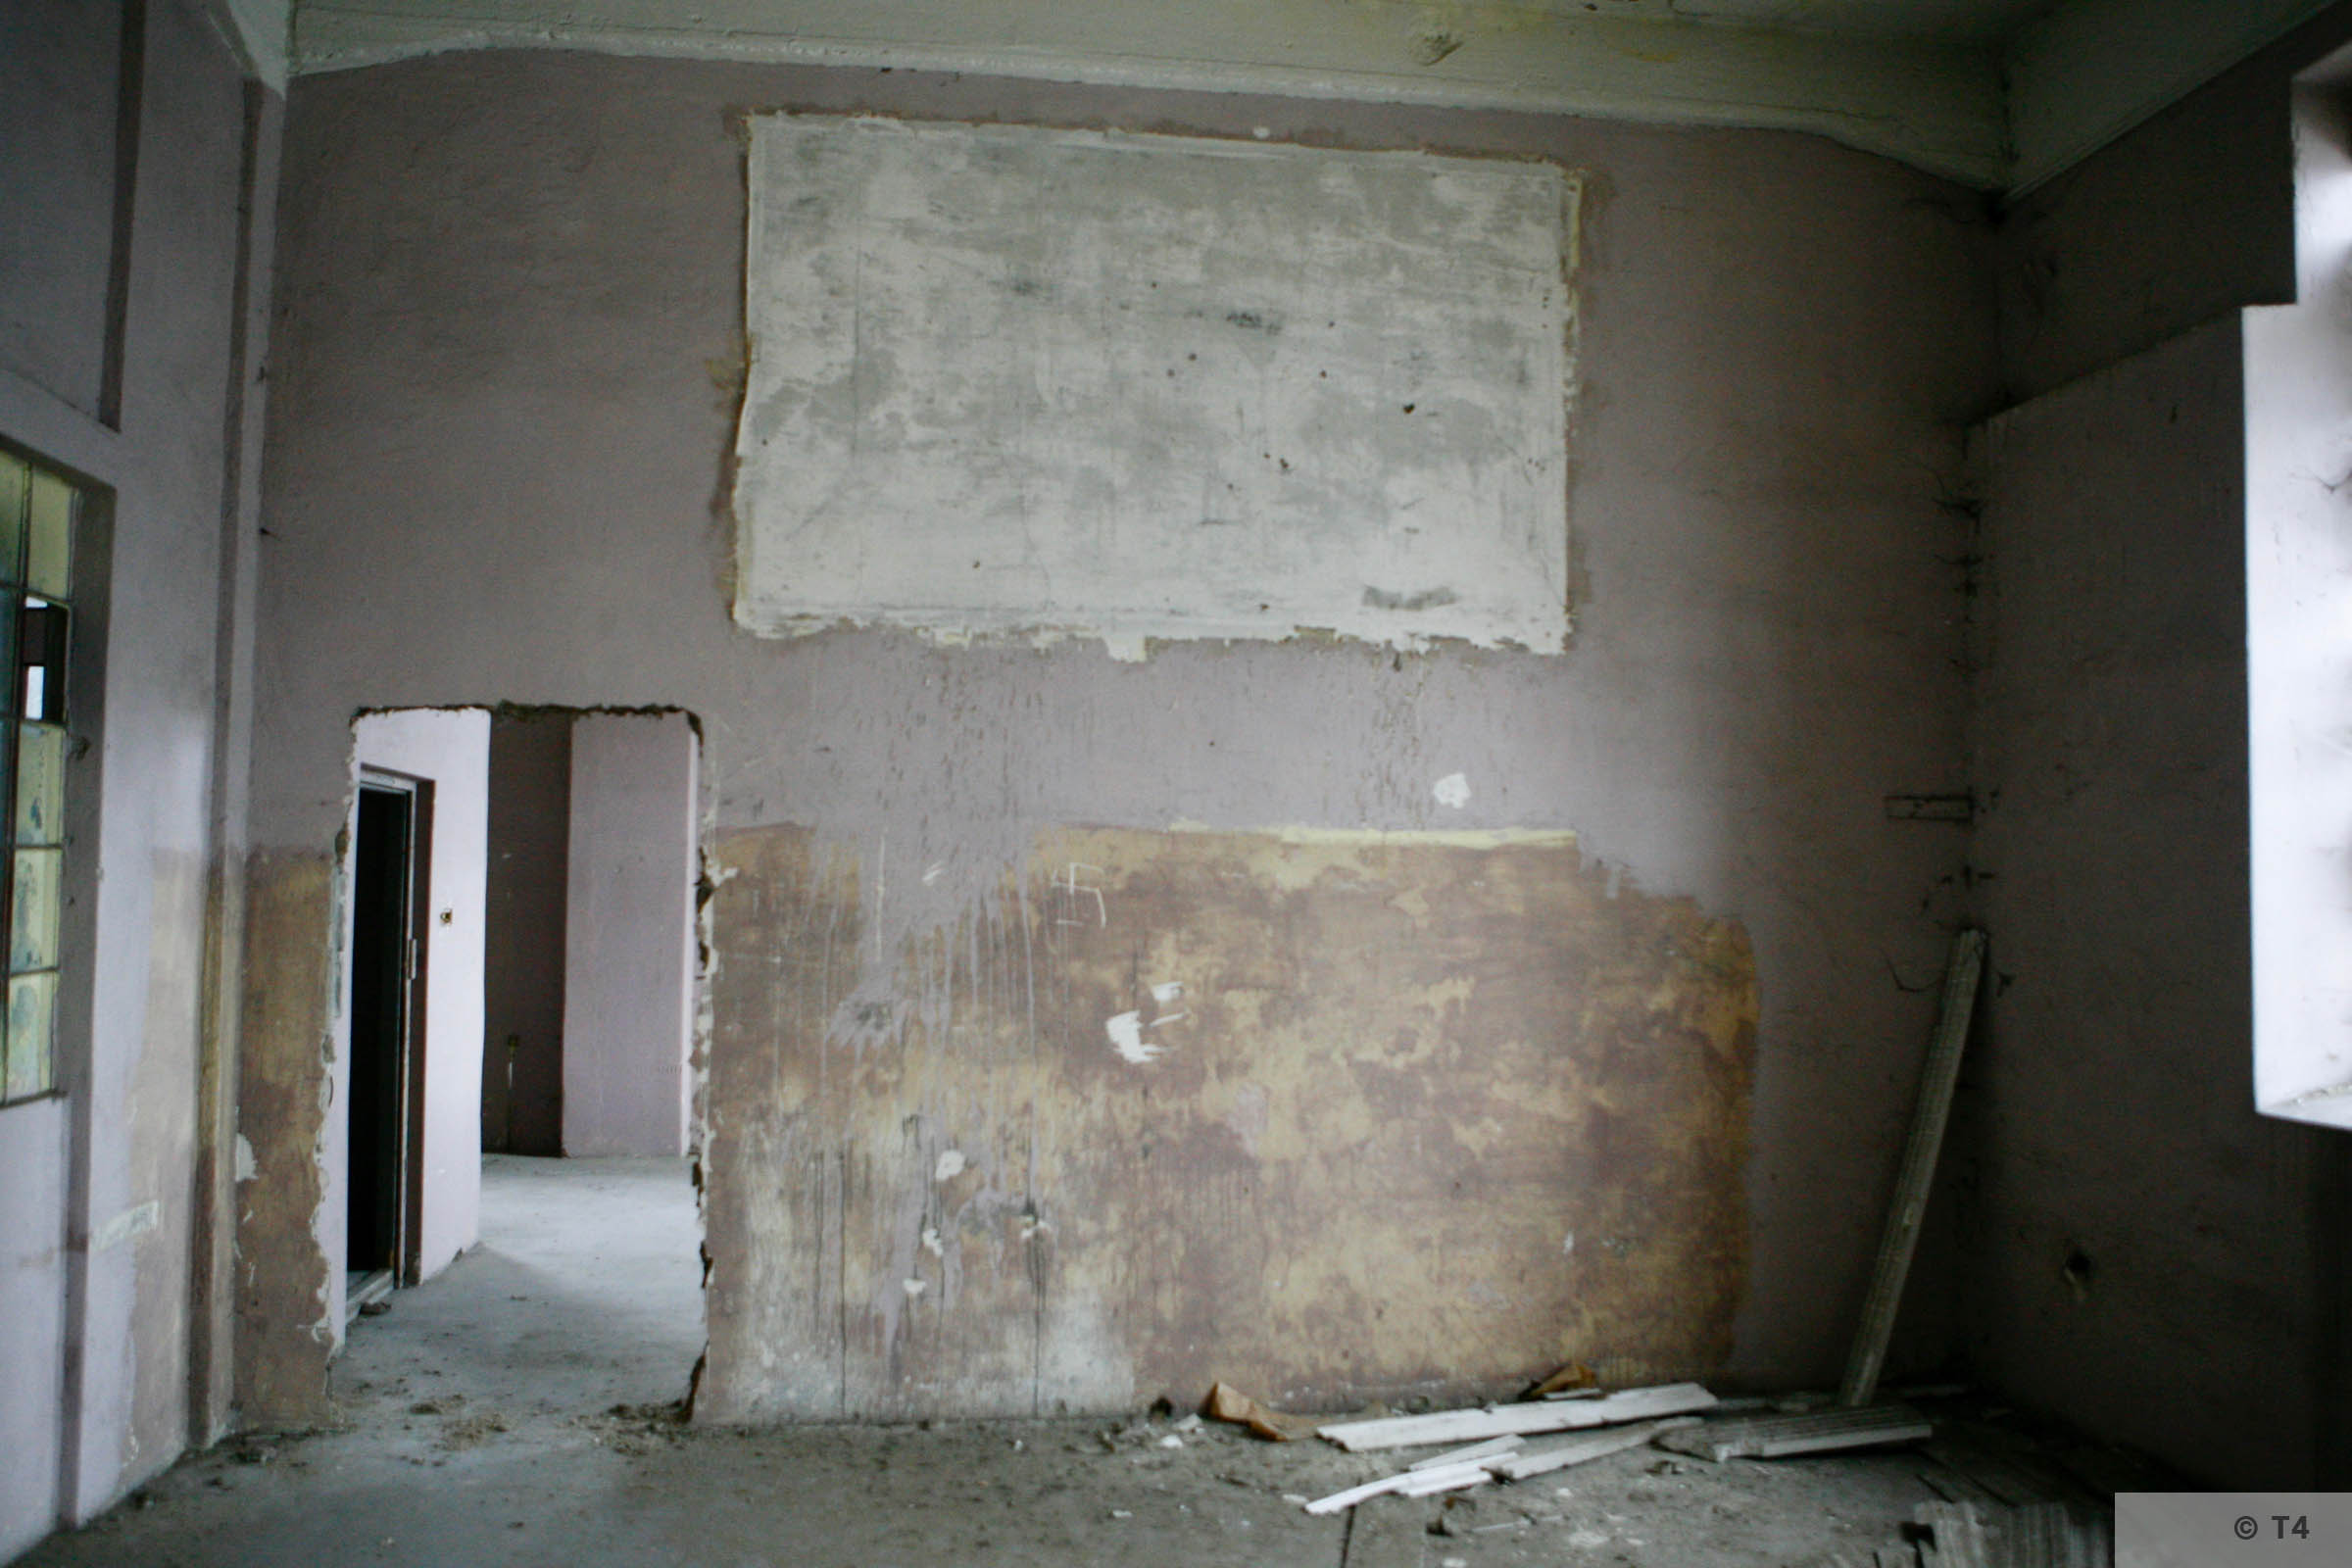 Remnants of frescos. 2006 T4 3409